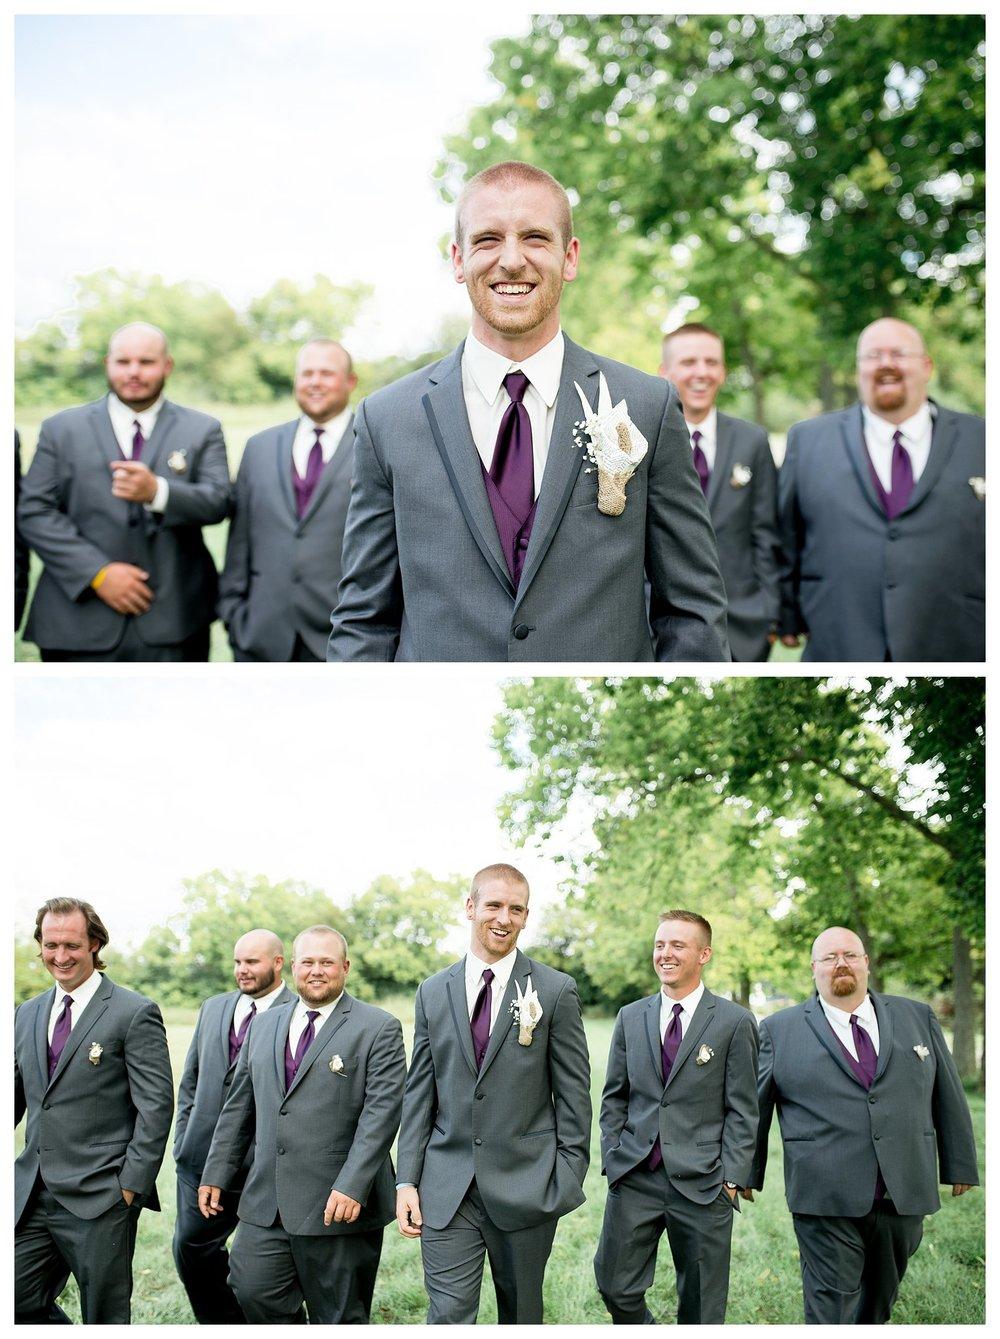 everleigh-photography-cincinnati-wedding-photographer-lake-lyndsay-wedding-hamilton-ohio_8